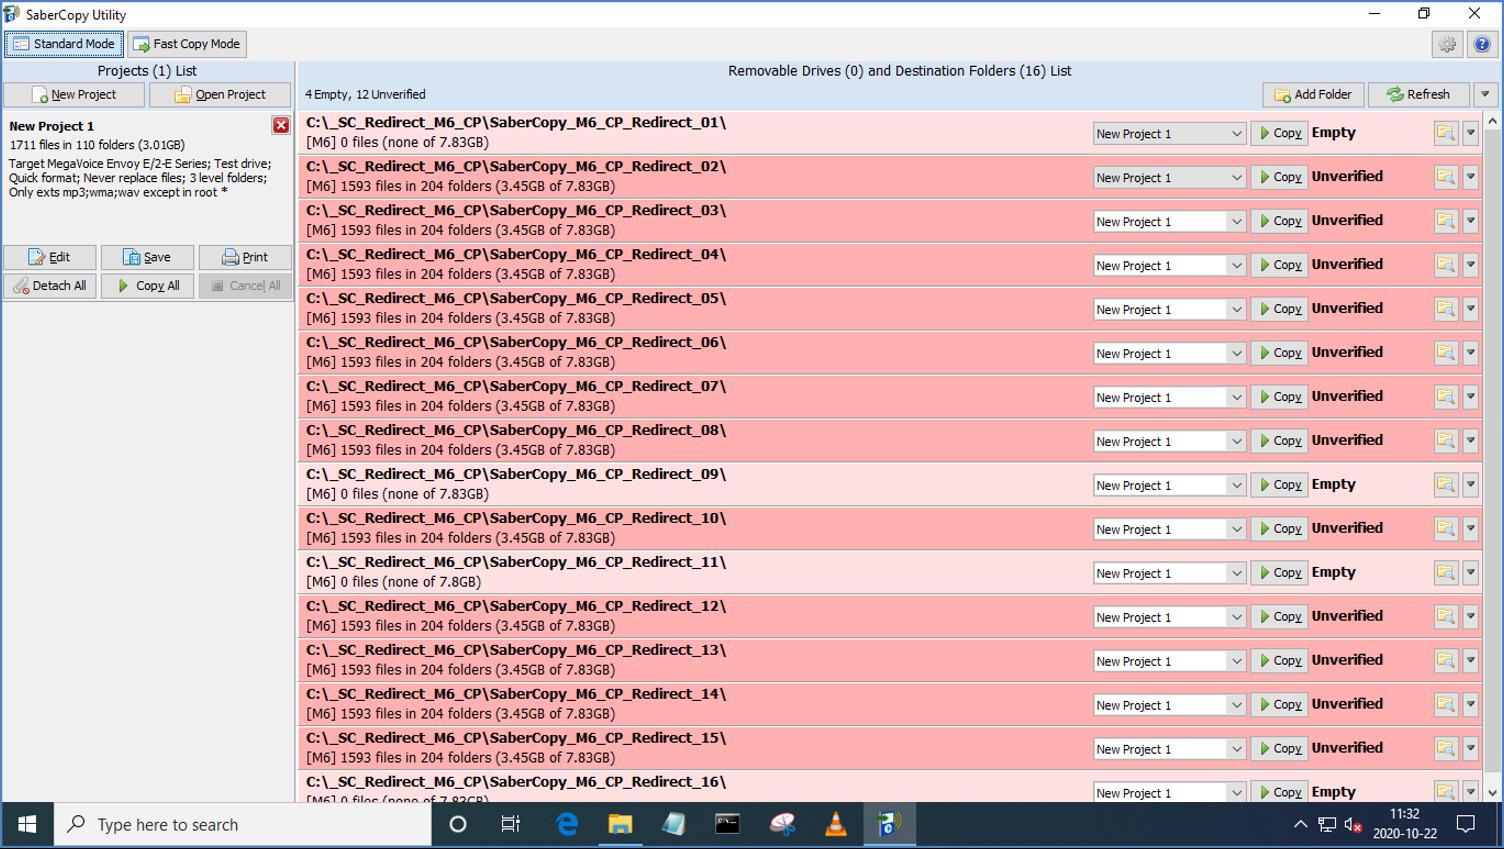 MegaVoice SaberCopy - Screenshot 10